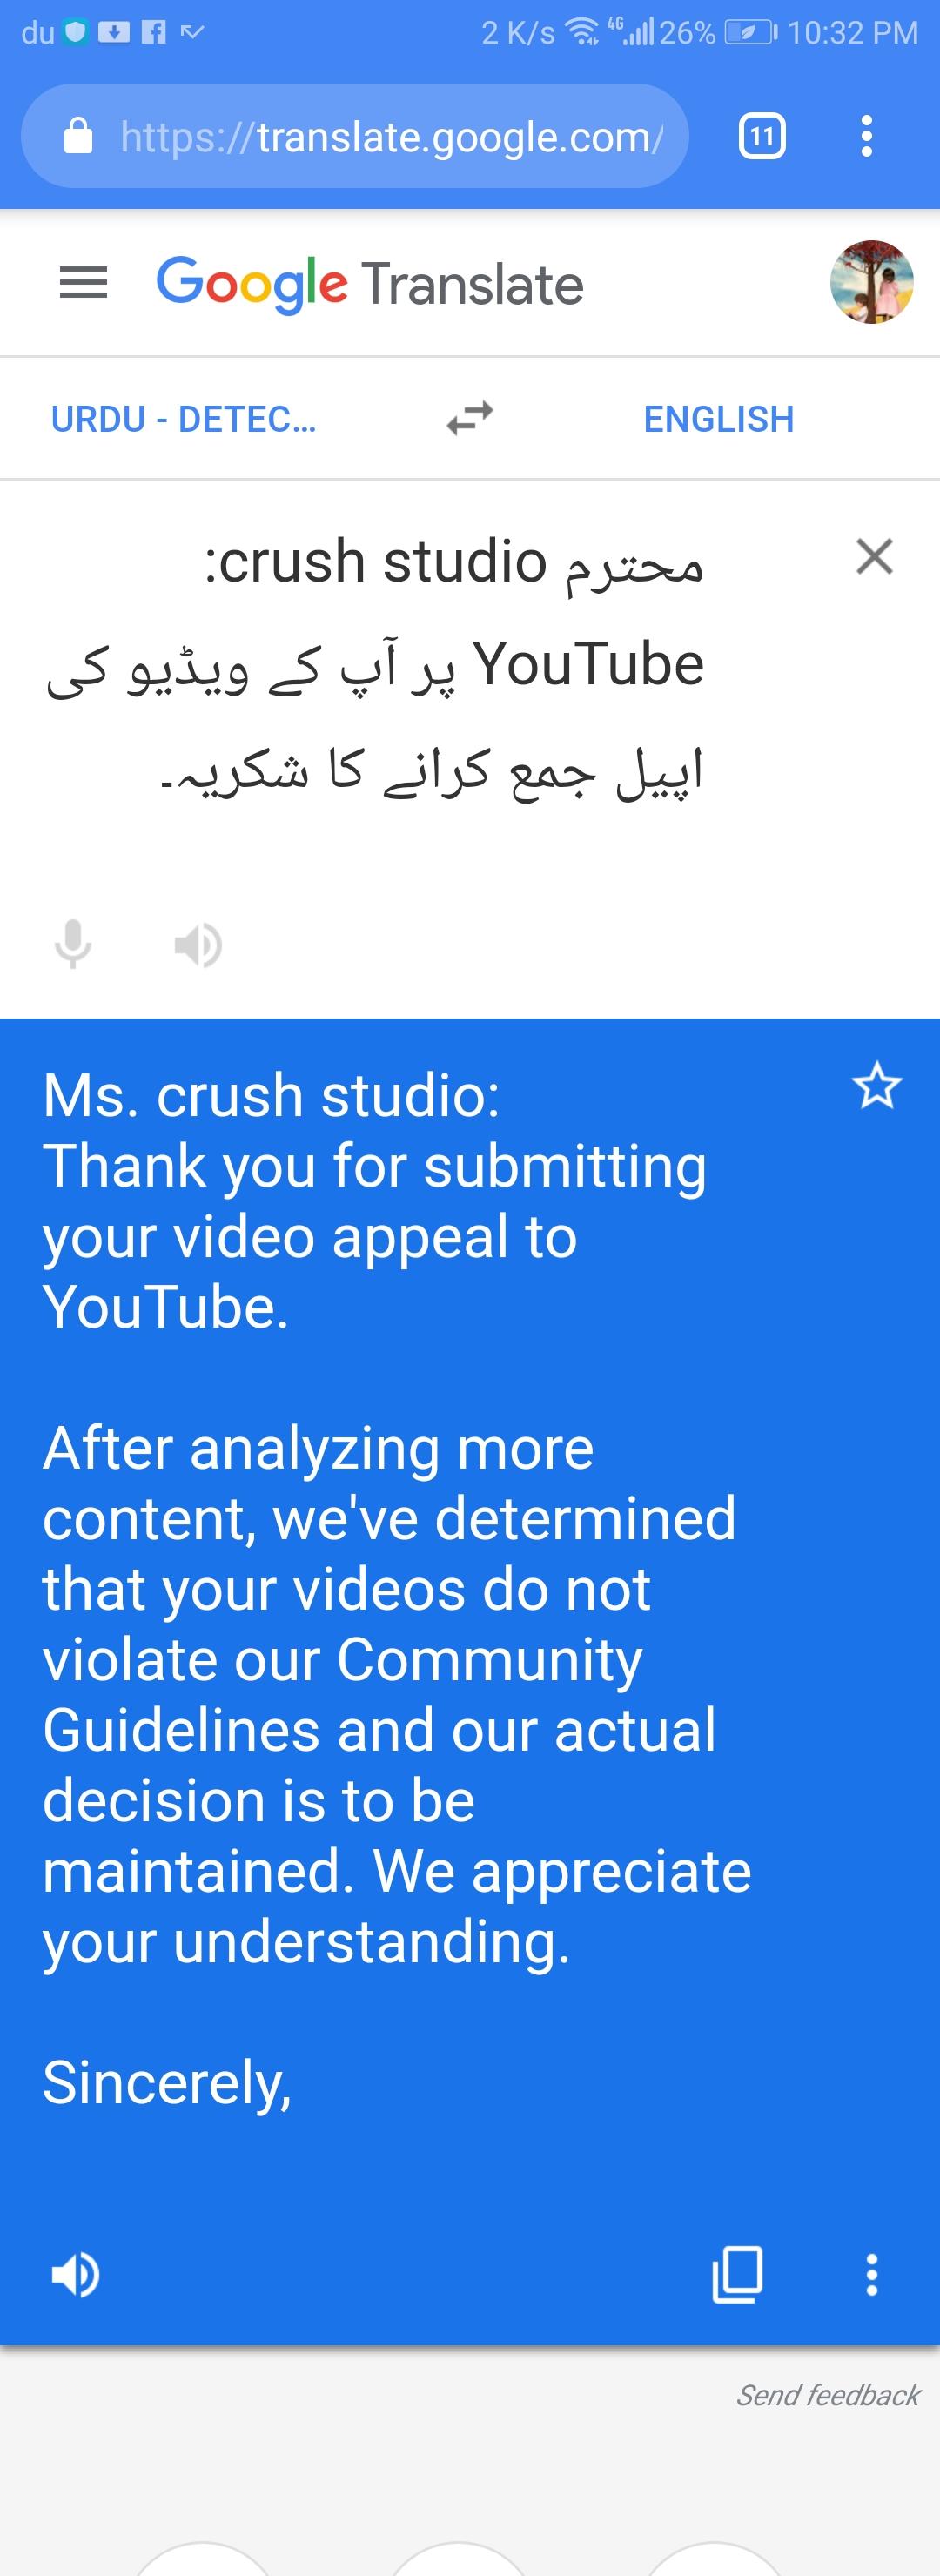 How can i - YouTube Help